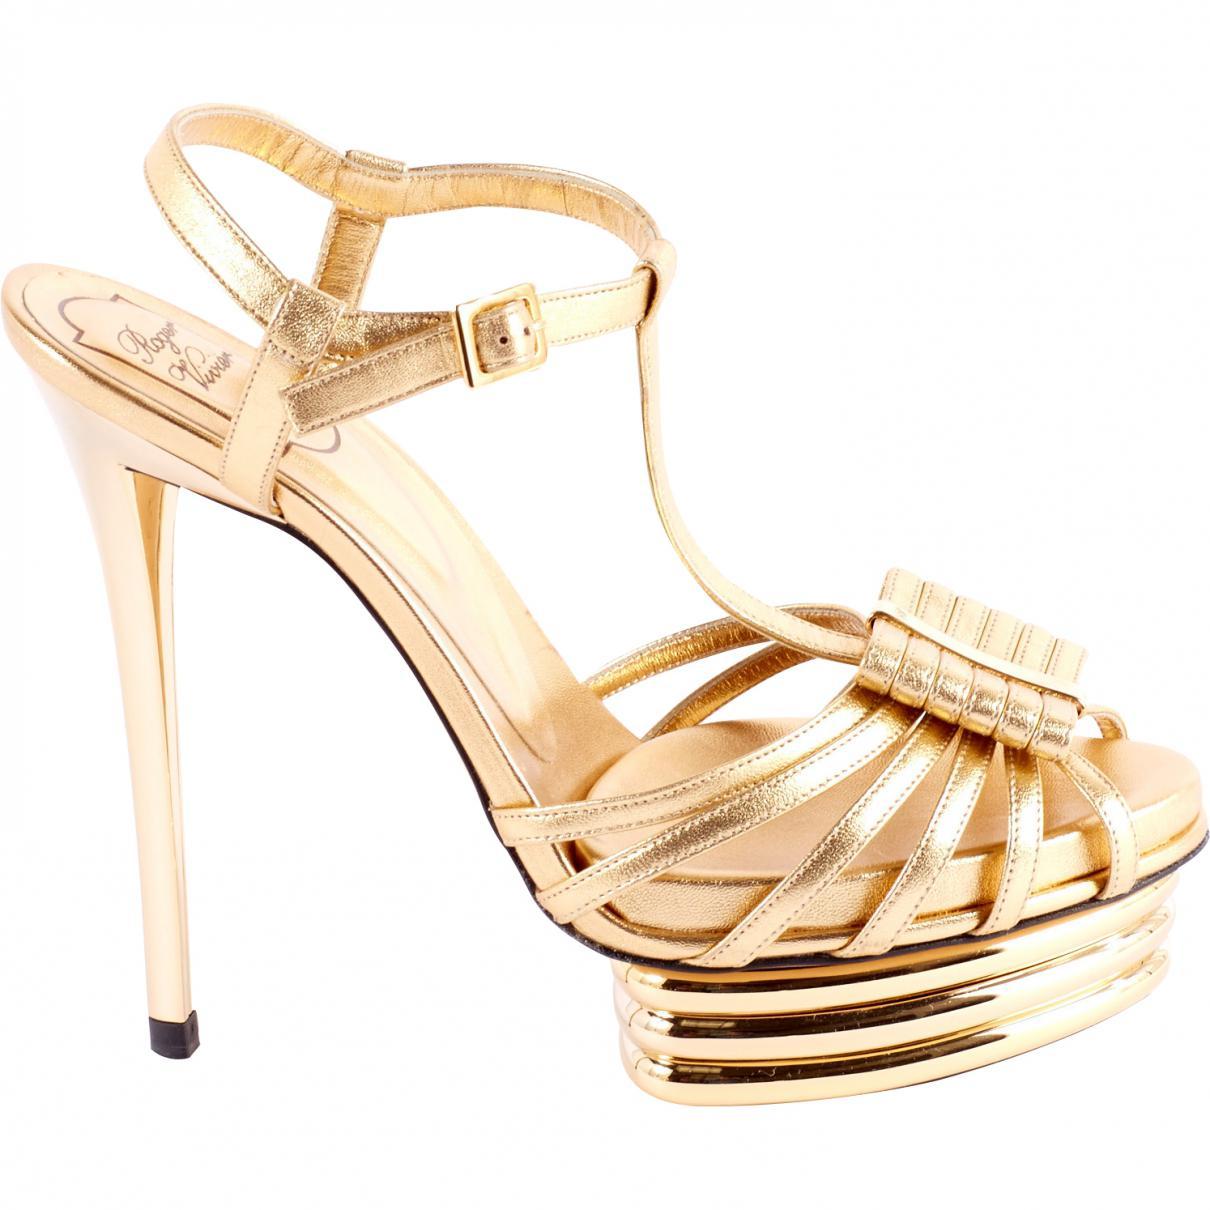 Pre-owned - Sandals Roger Vivier cNaIY